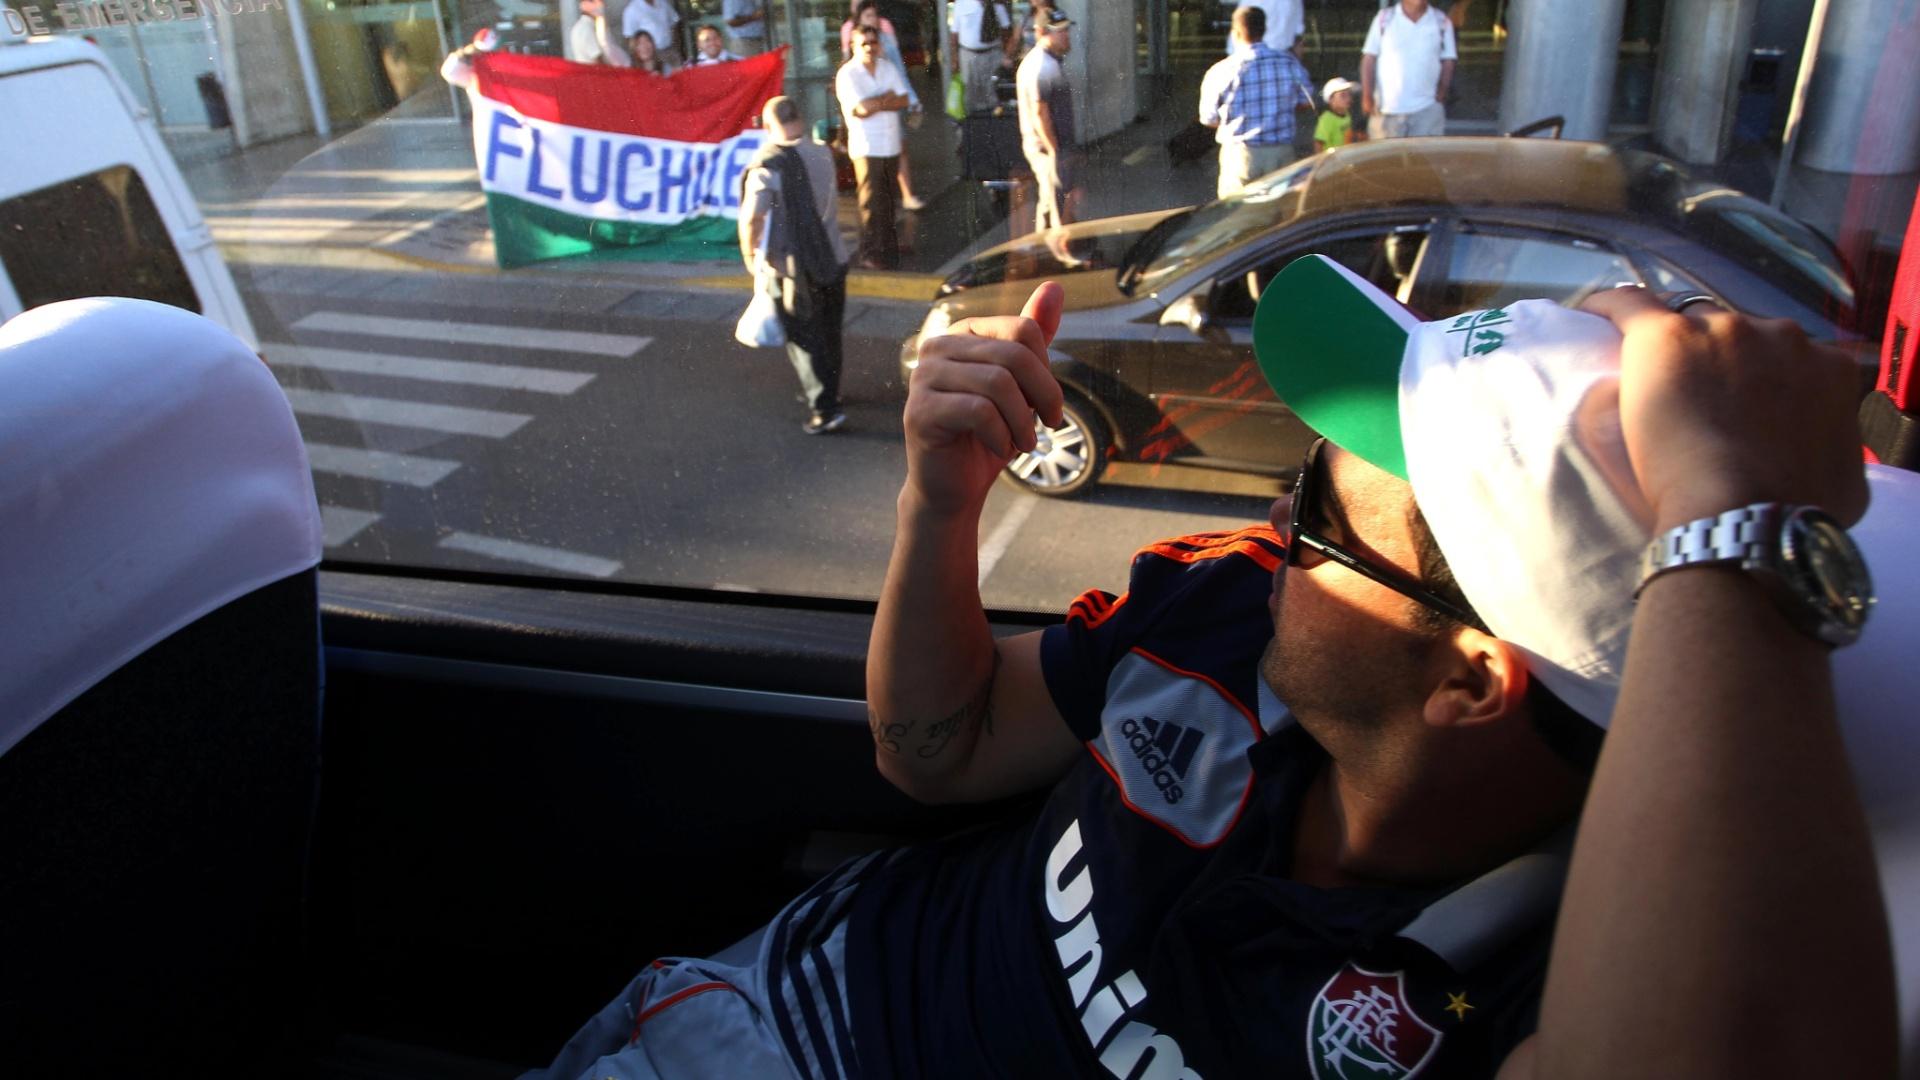 Deco acena para torcedores do Fluminense no Chile, após chegada para enfrentar o Huachipato